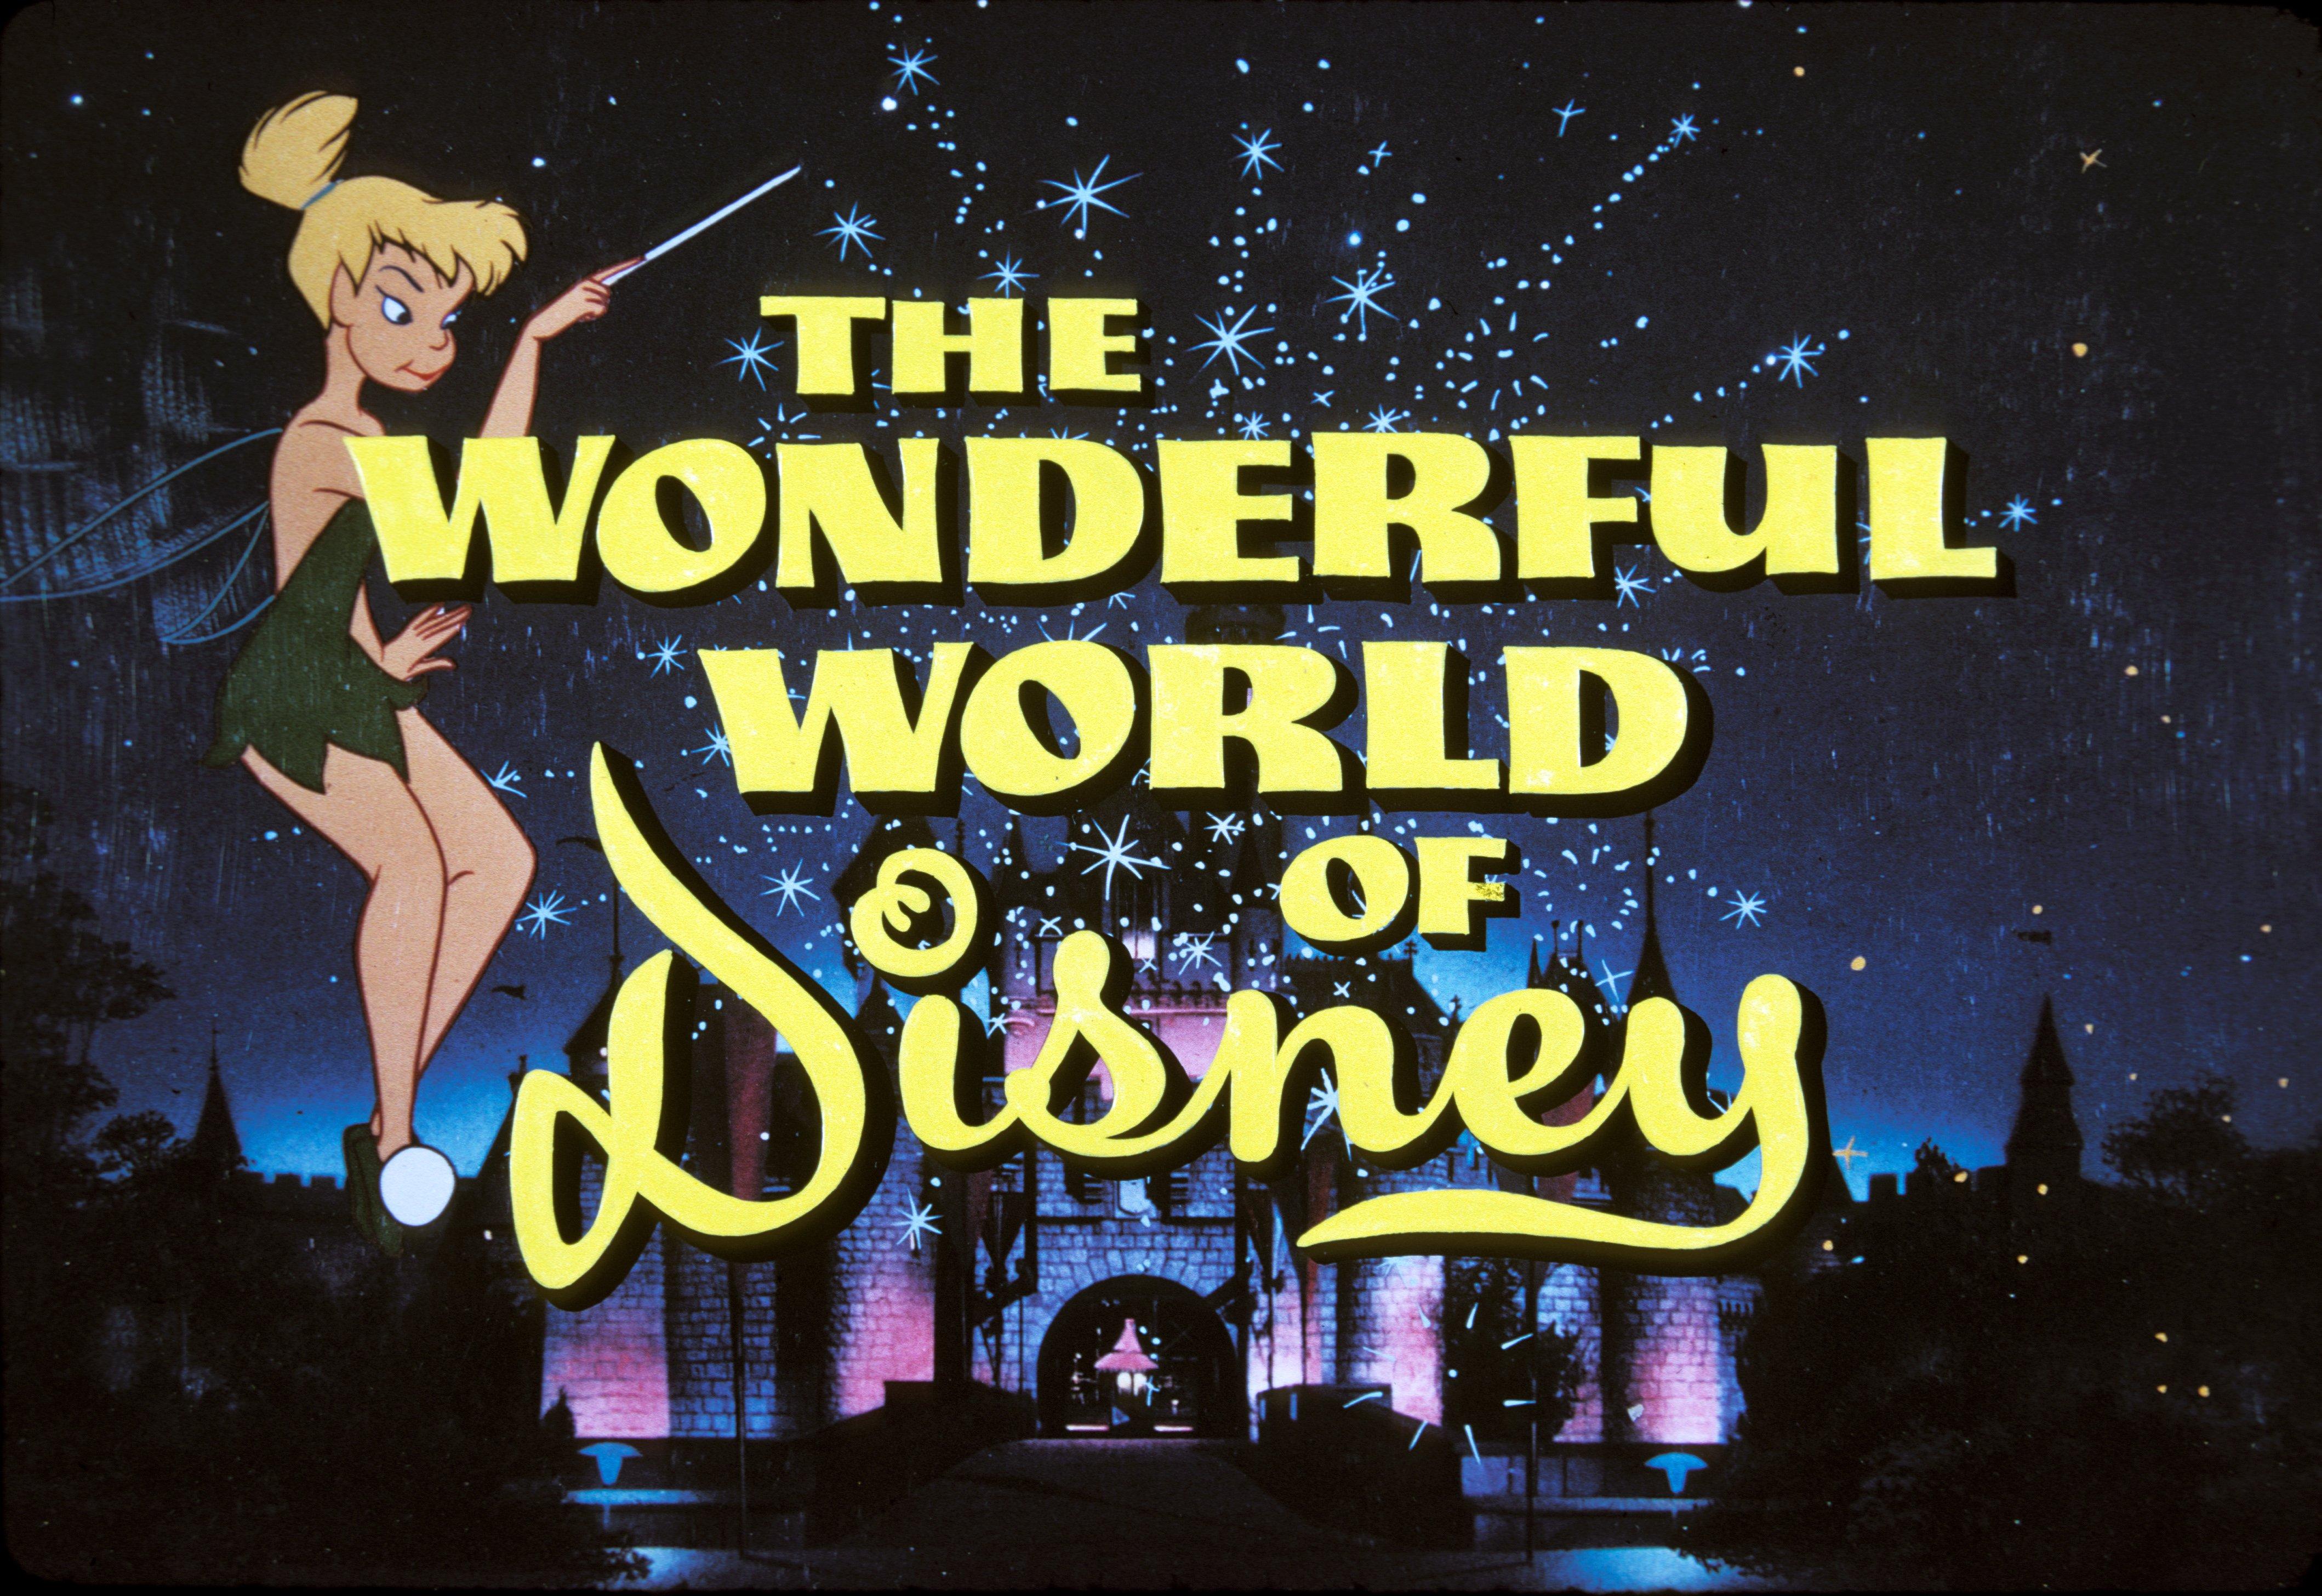 Wonderful world of sex episodes